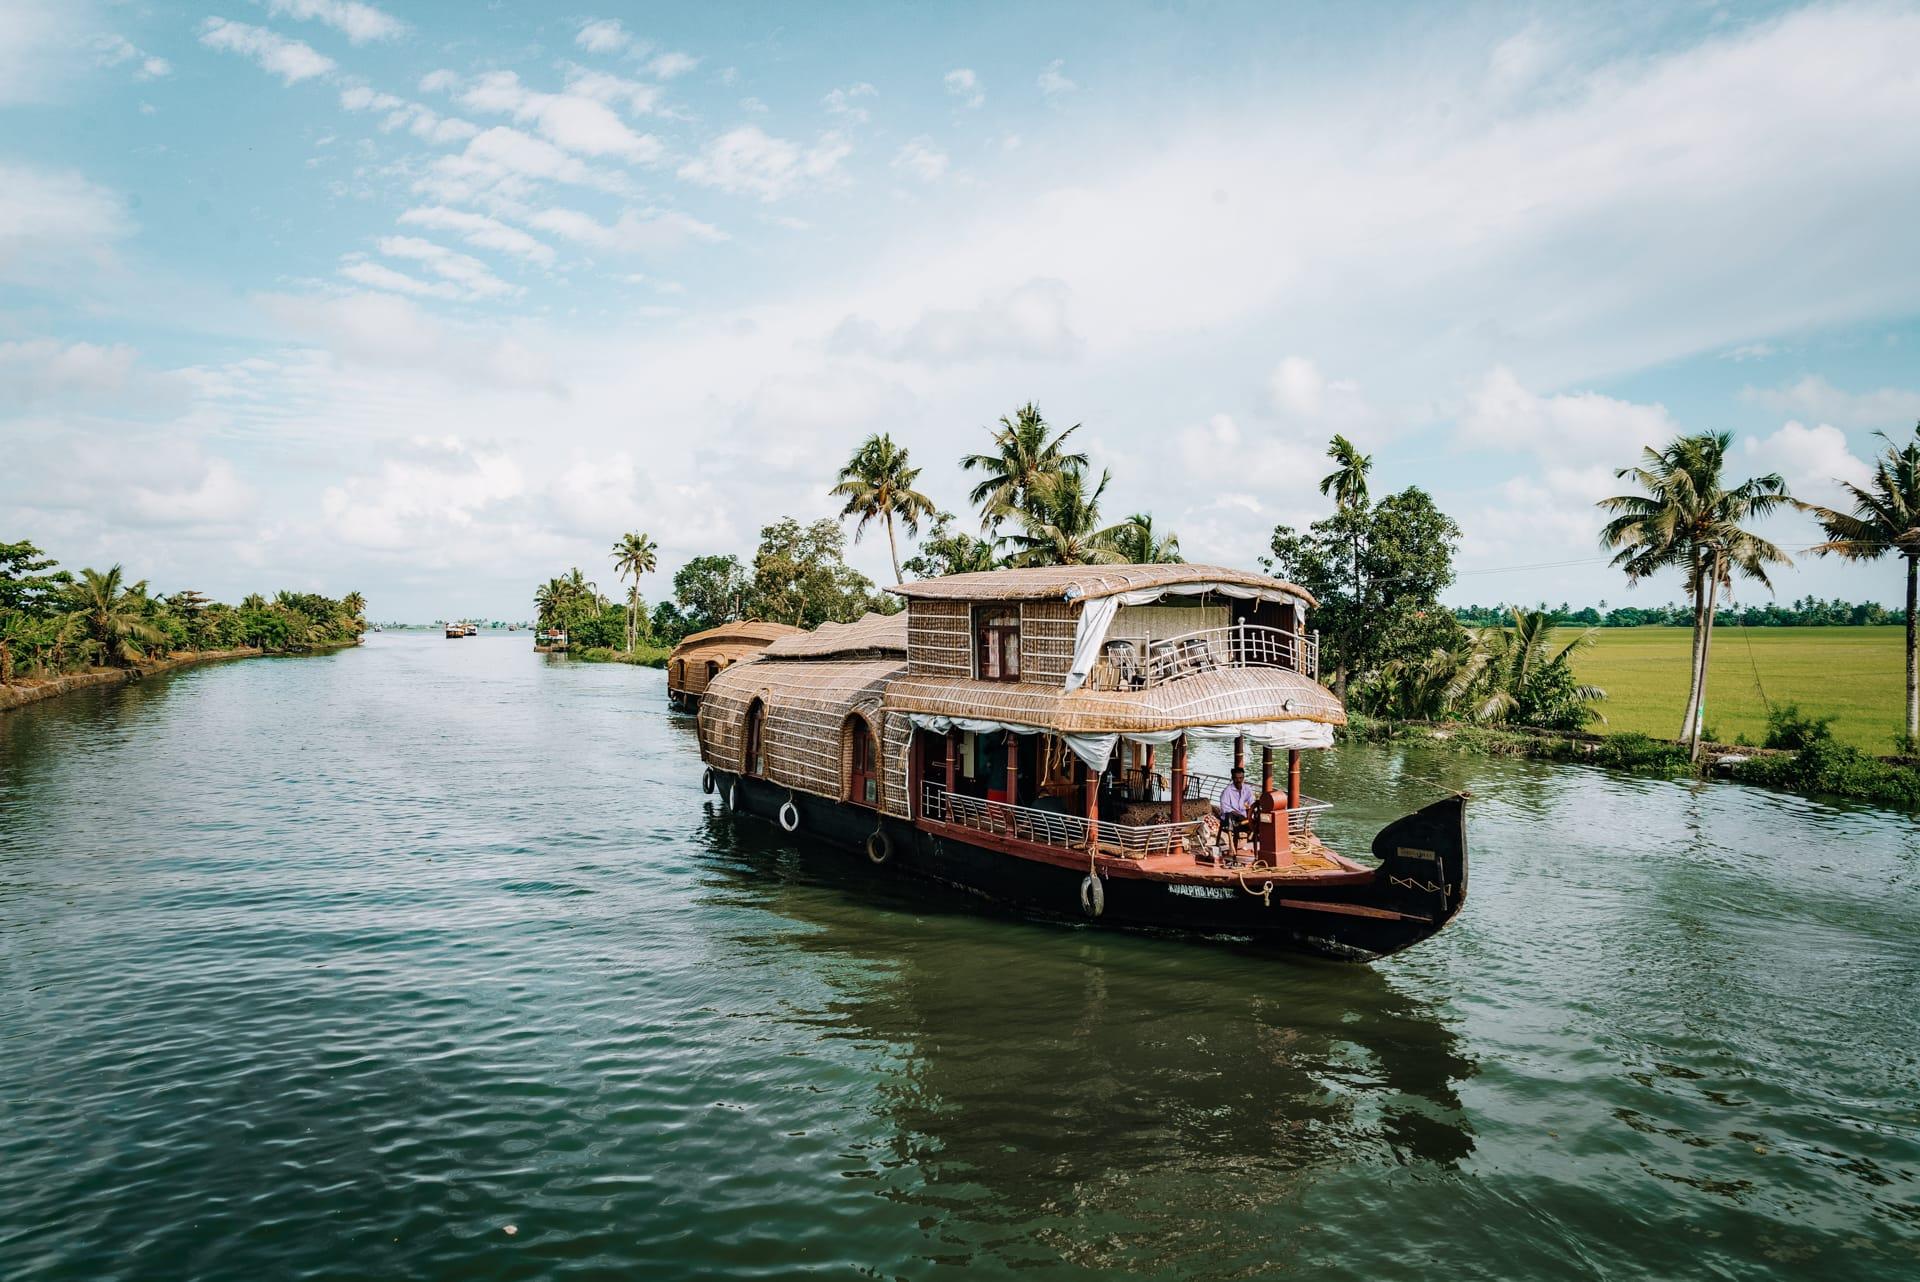 kerala india boat tour